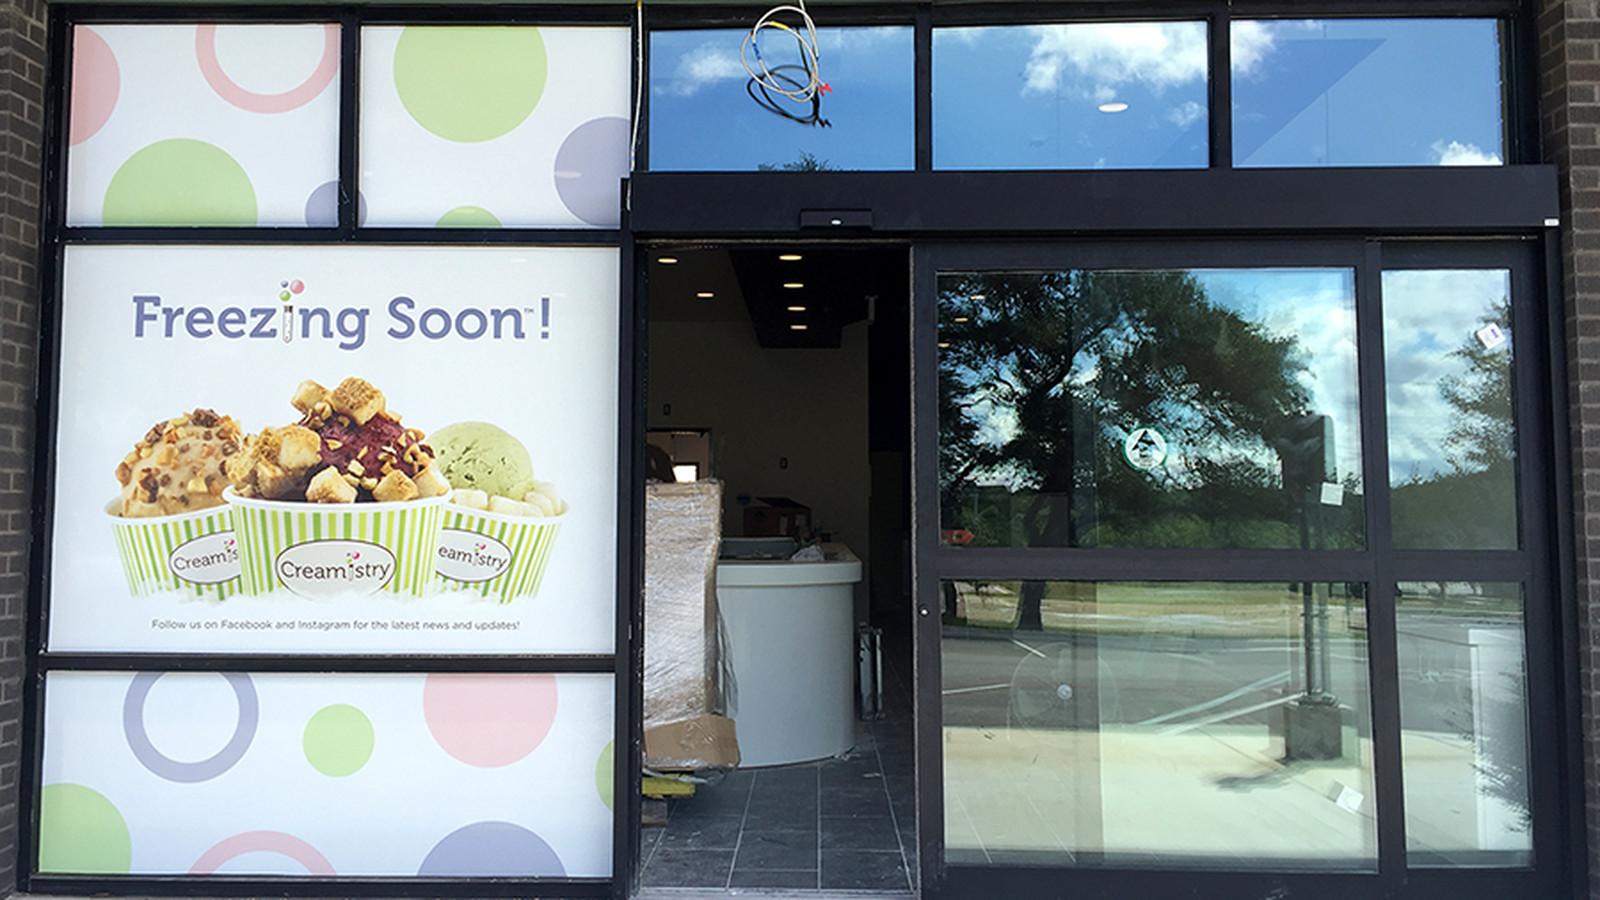 More Details On California Liquid Nitrogen Ice Cream Chain S Texas Expansion